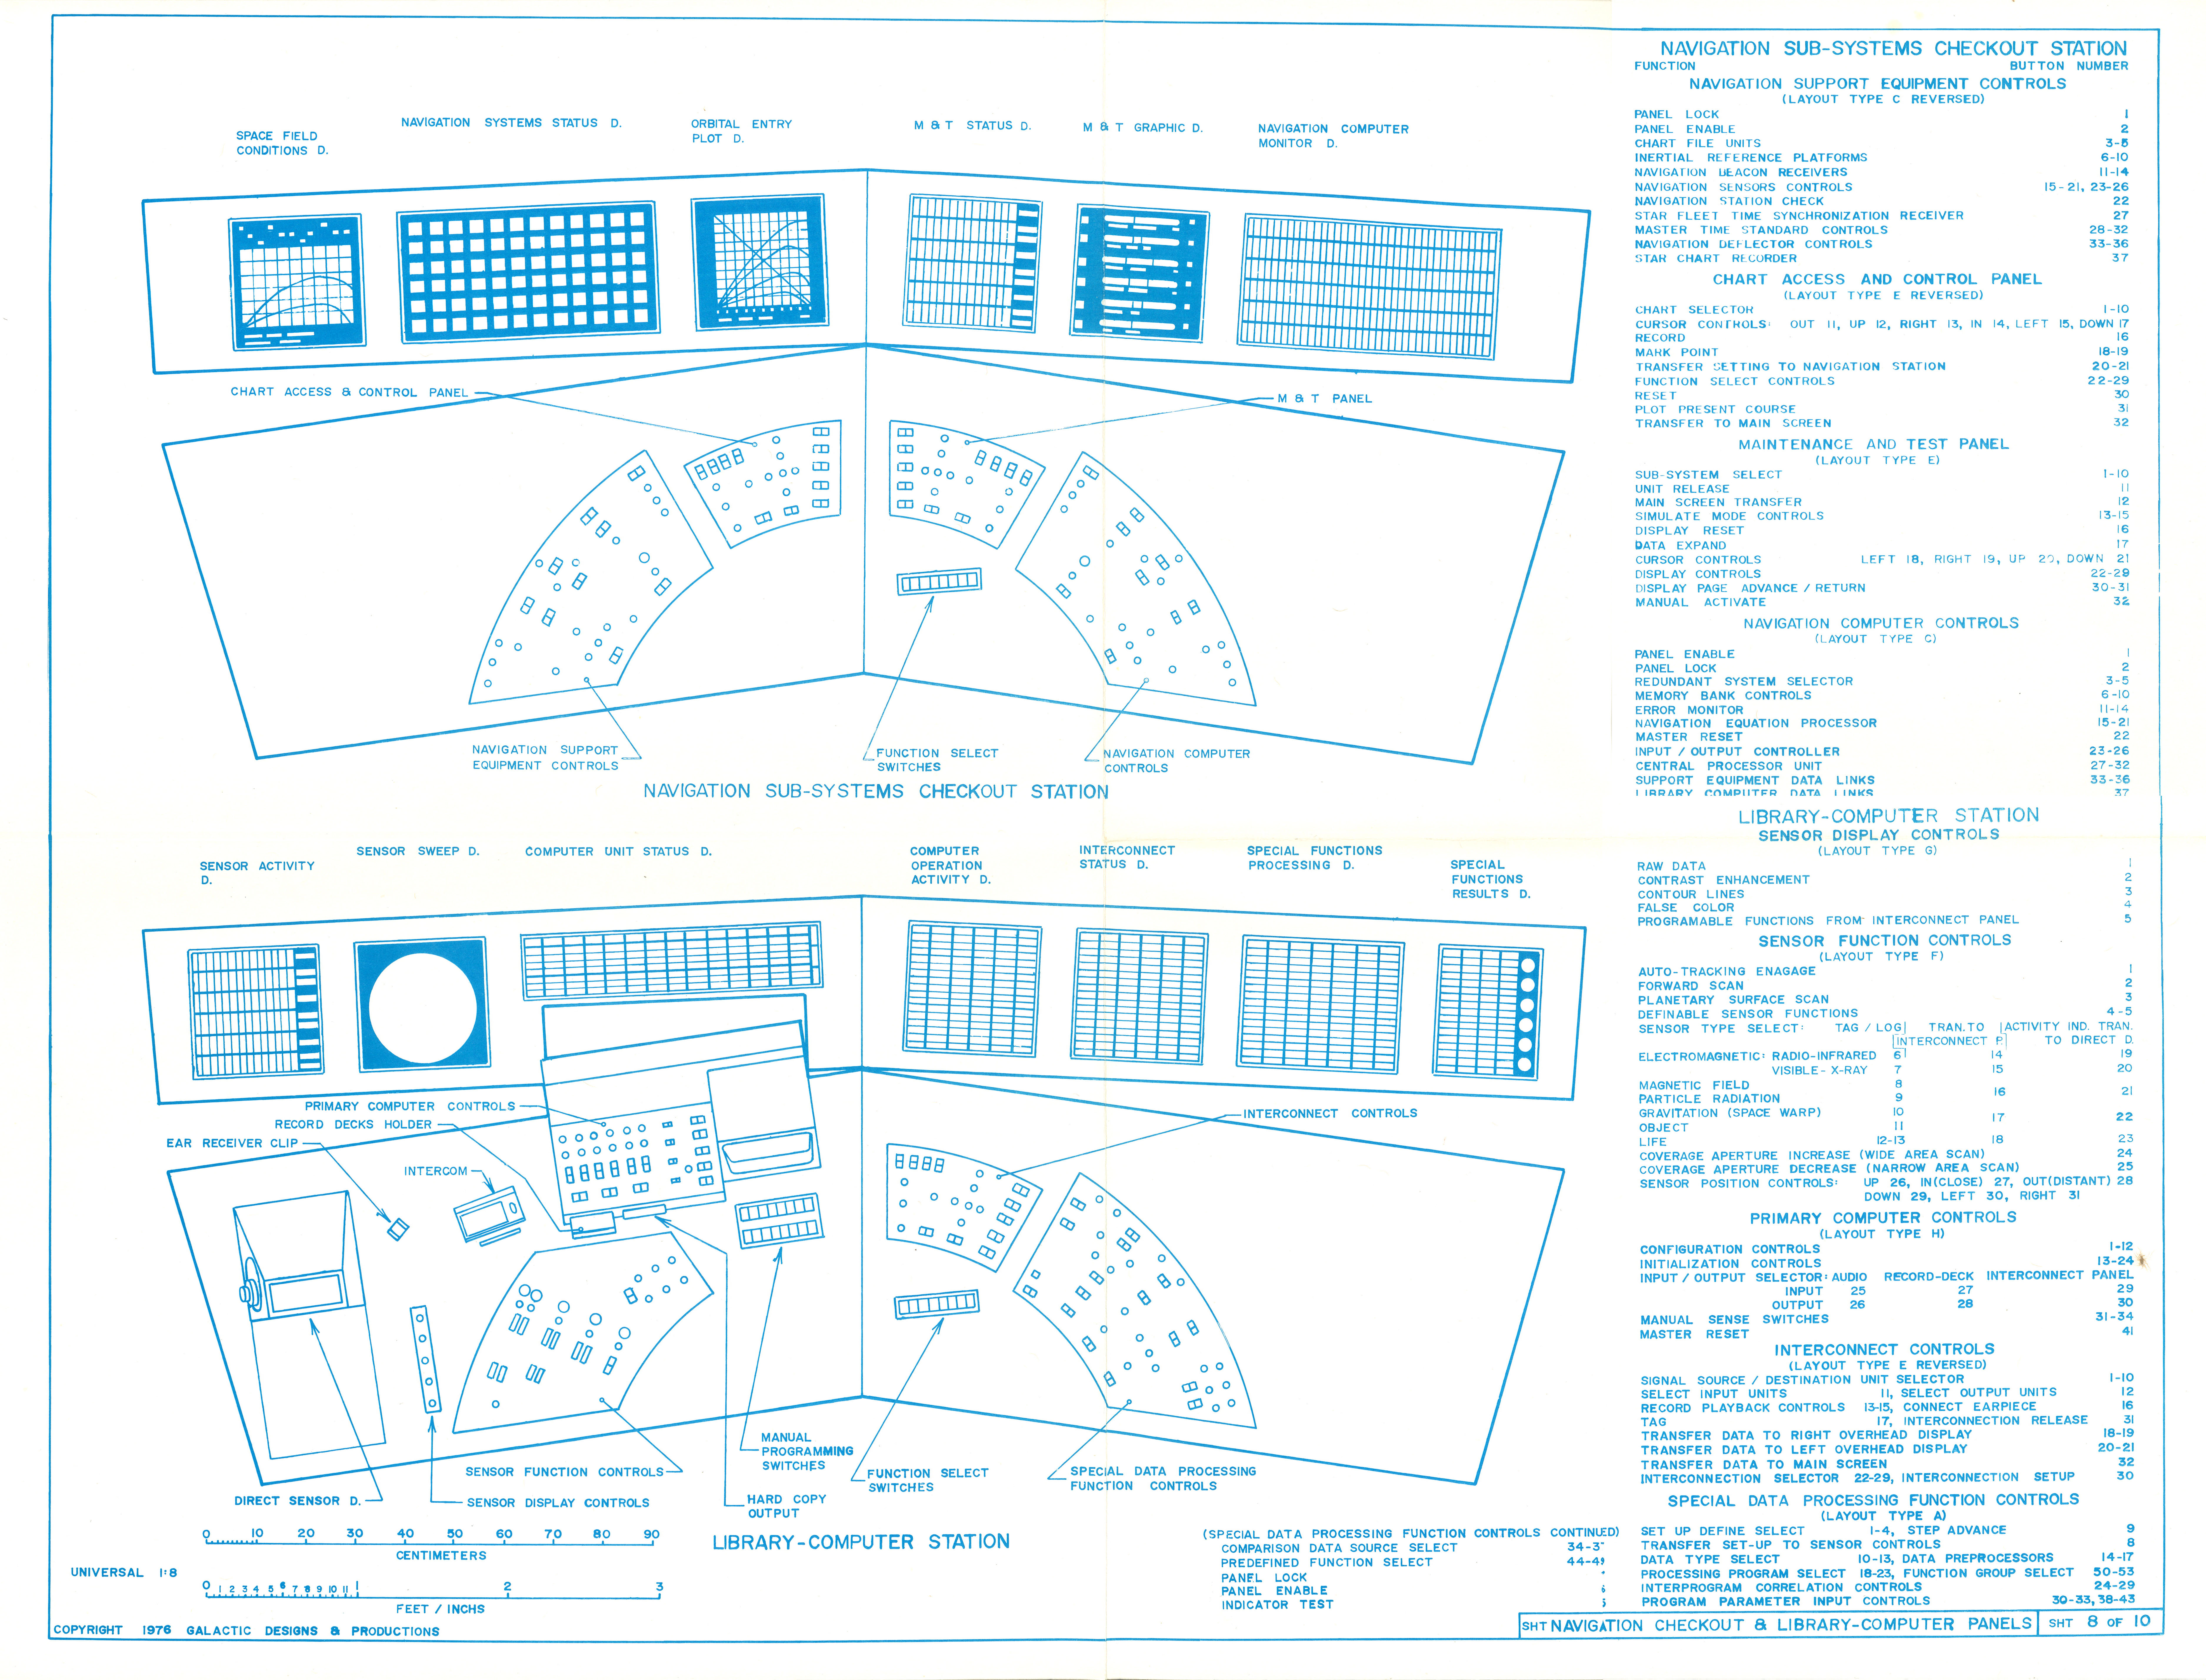 Uss enterprise bridge blueprints by michael mcmaster malvernweather Choice Image